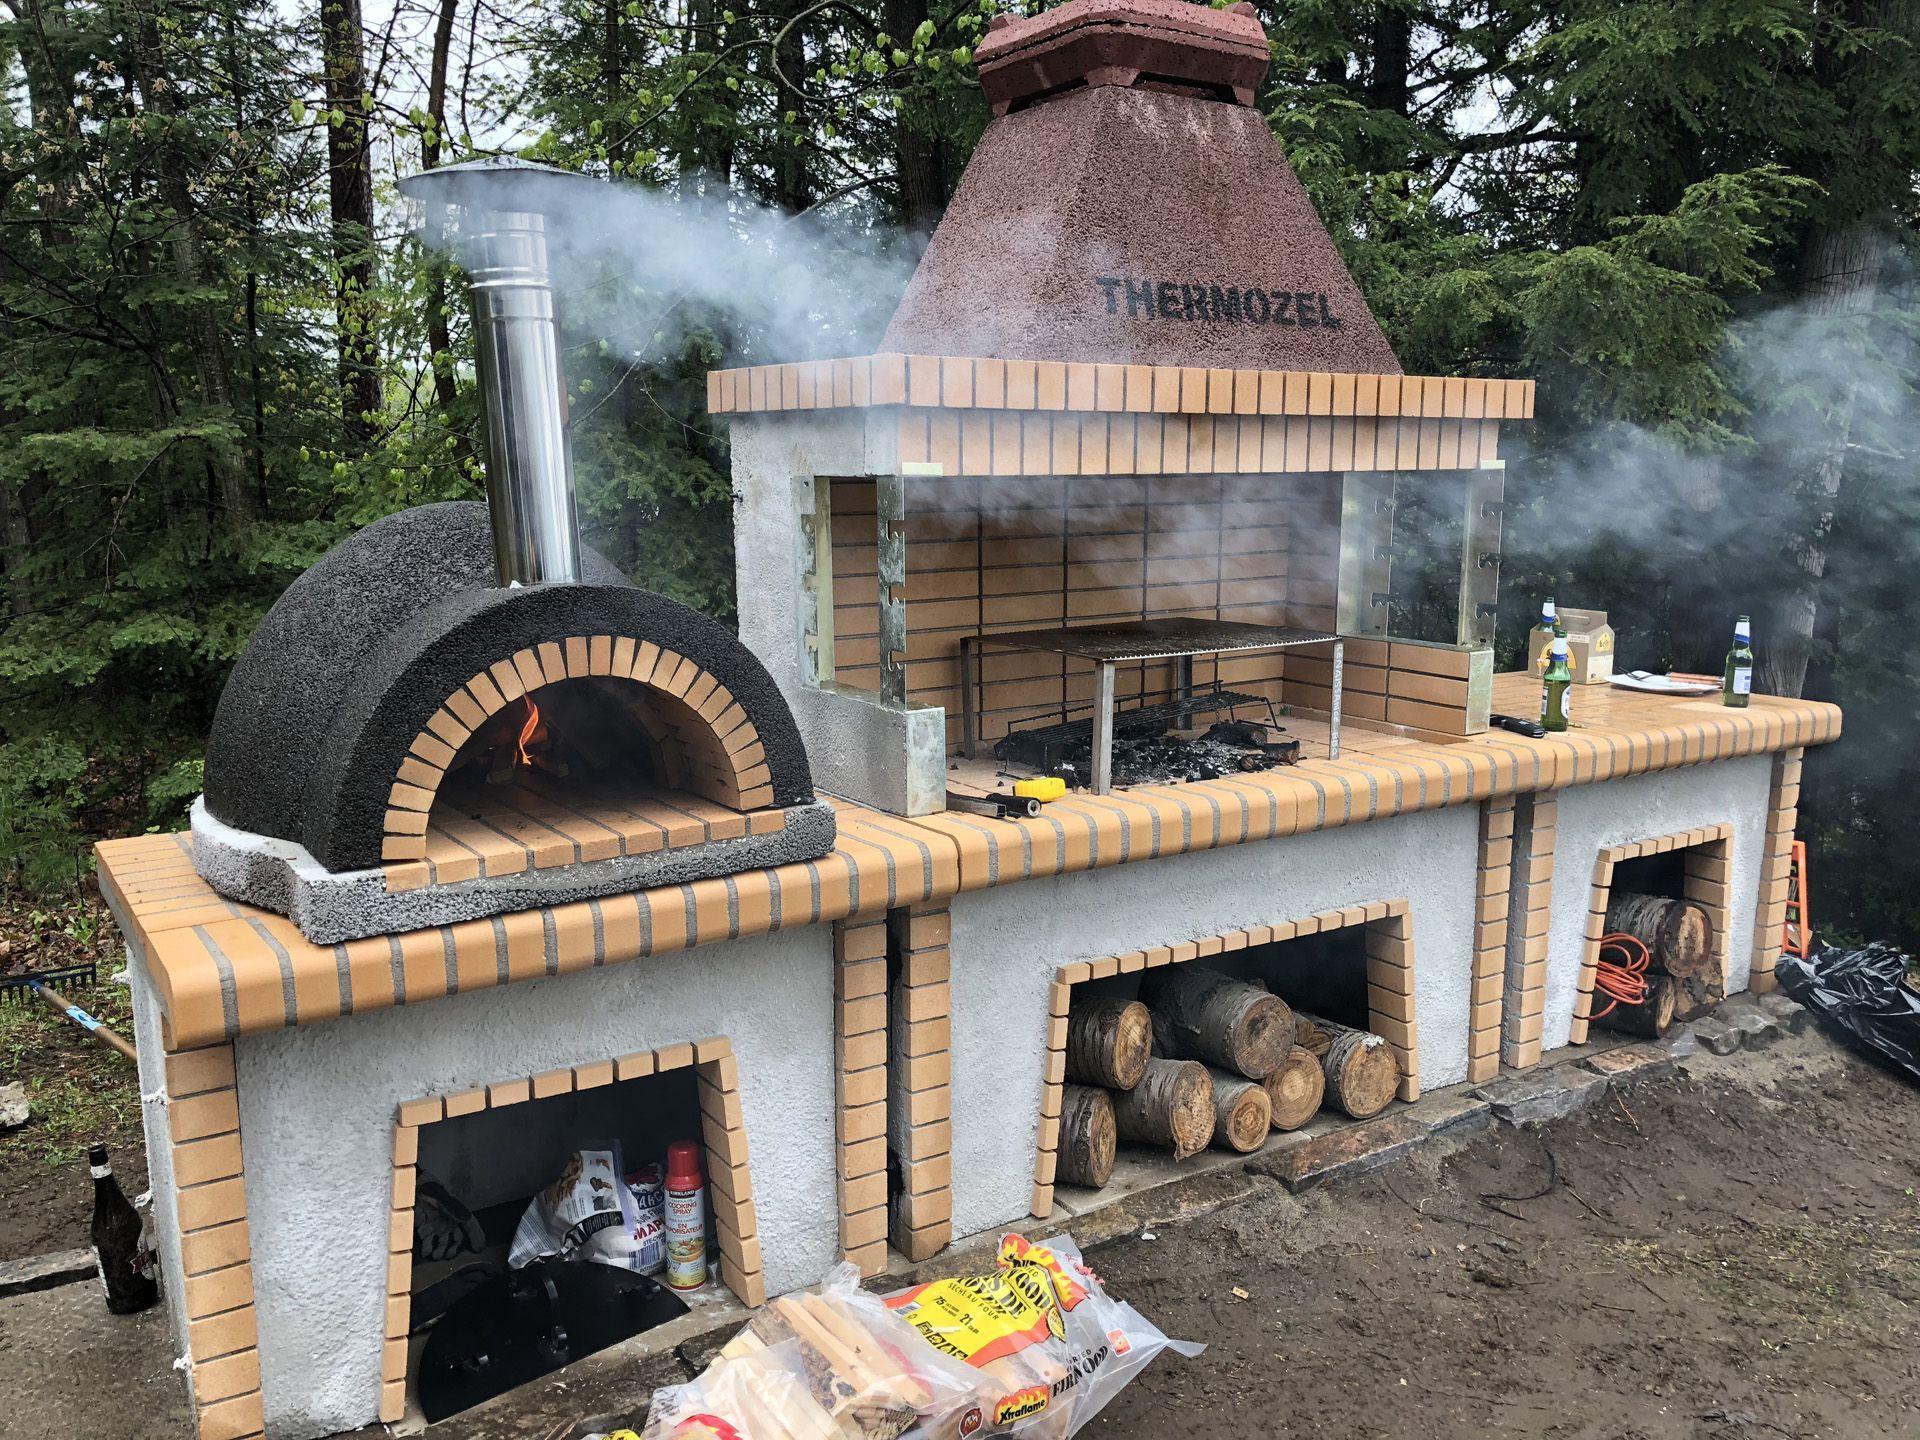 Outdoor Kitchen Design Outdoor Kitchen Design Diy Outdoor Kitchen Design Floor Plans Outdoo In 2020 Pizza Oven Outdoor Brick Pizza Oven Outdoor Outdoor Bbq Kitchen